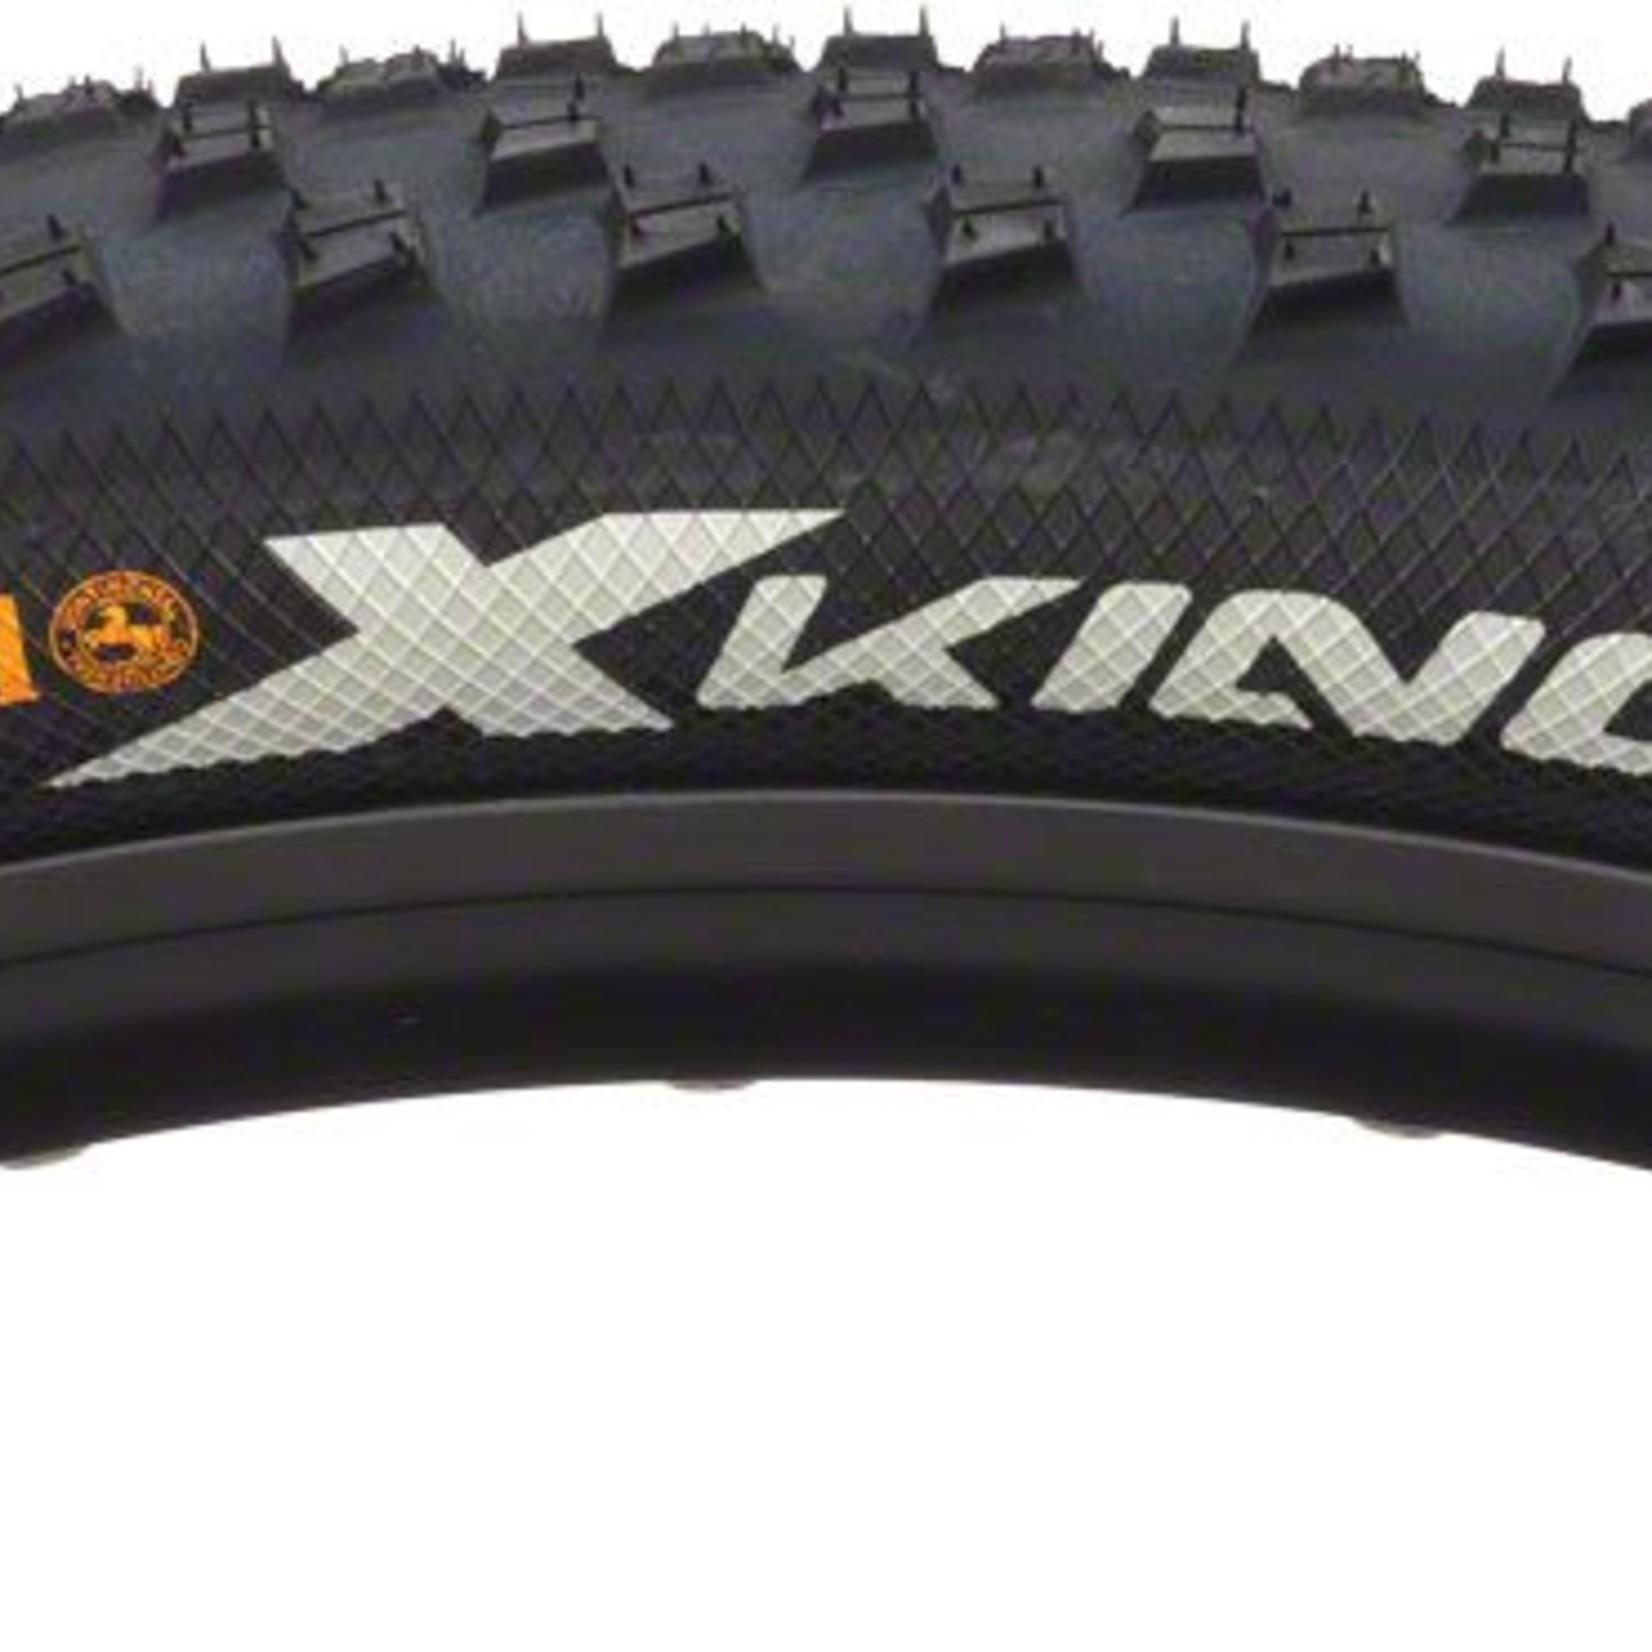 X King Tire 29x2.2 ProTection Folding